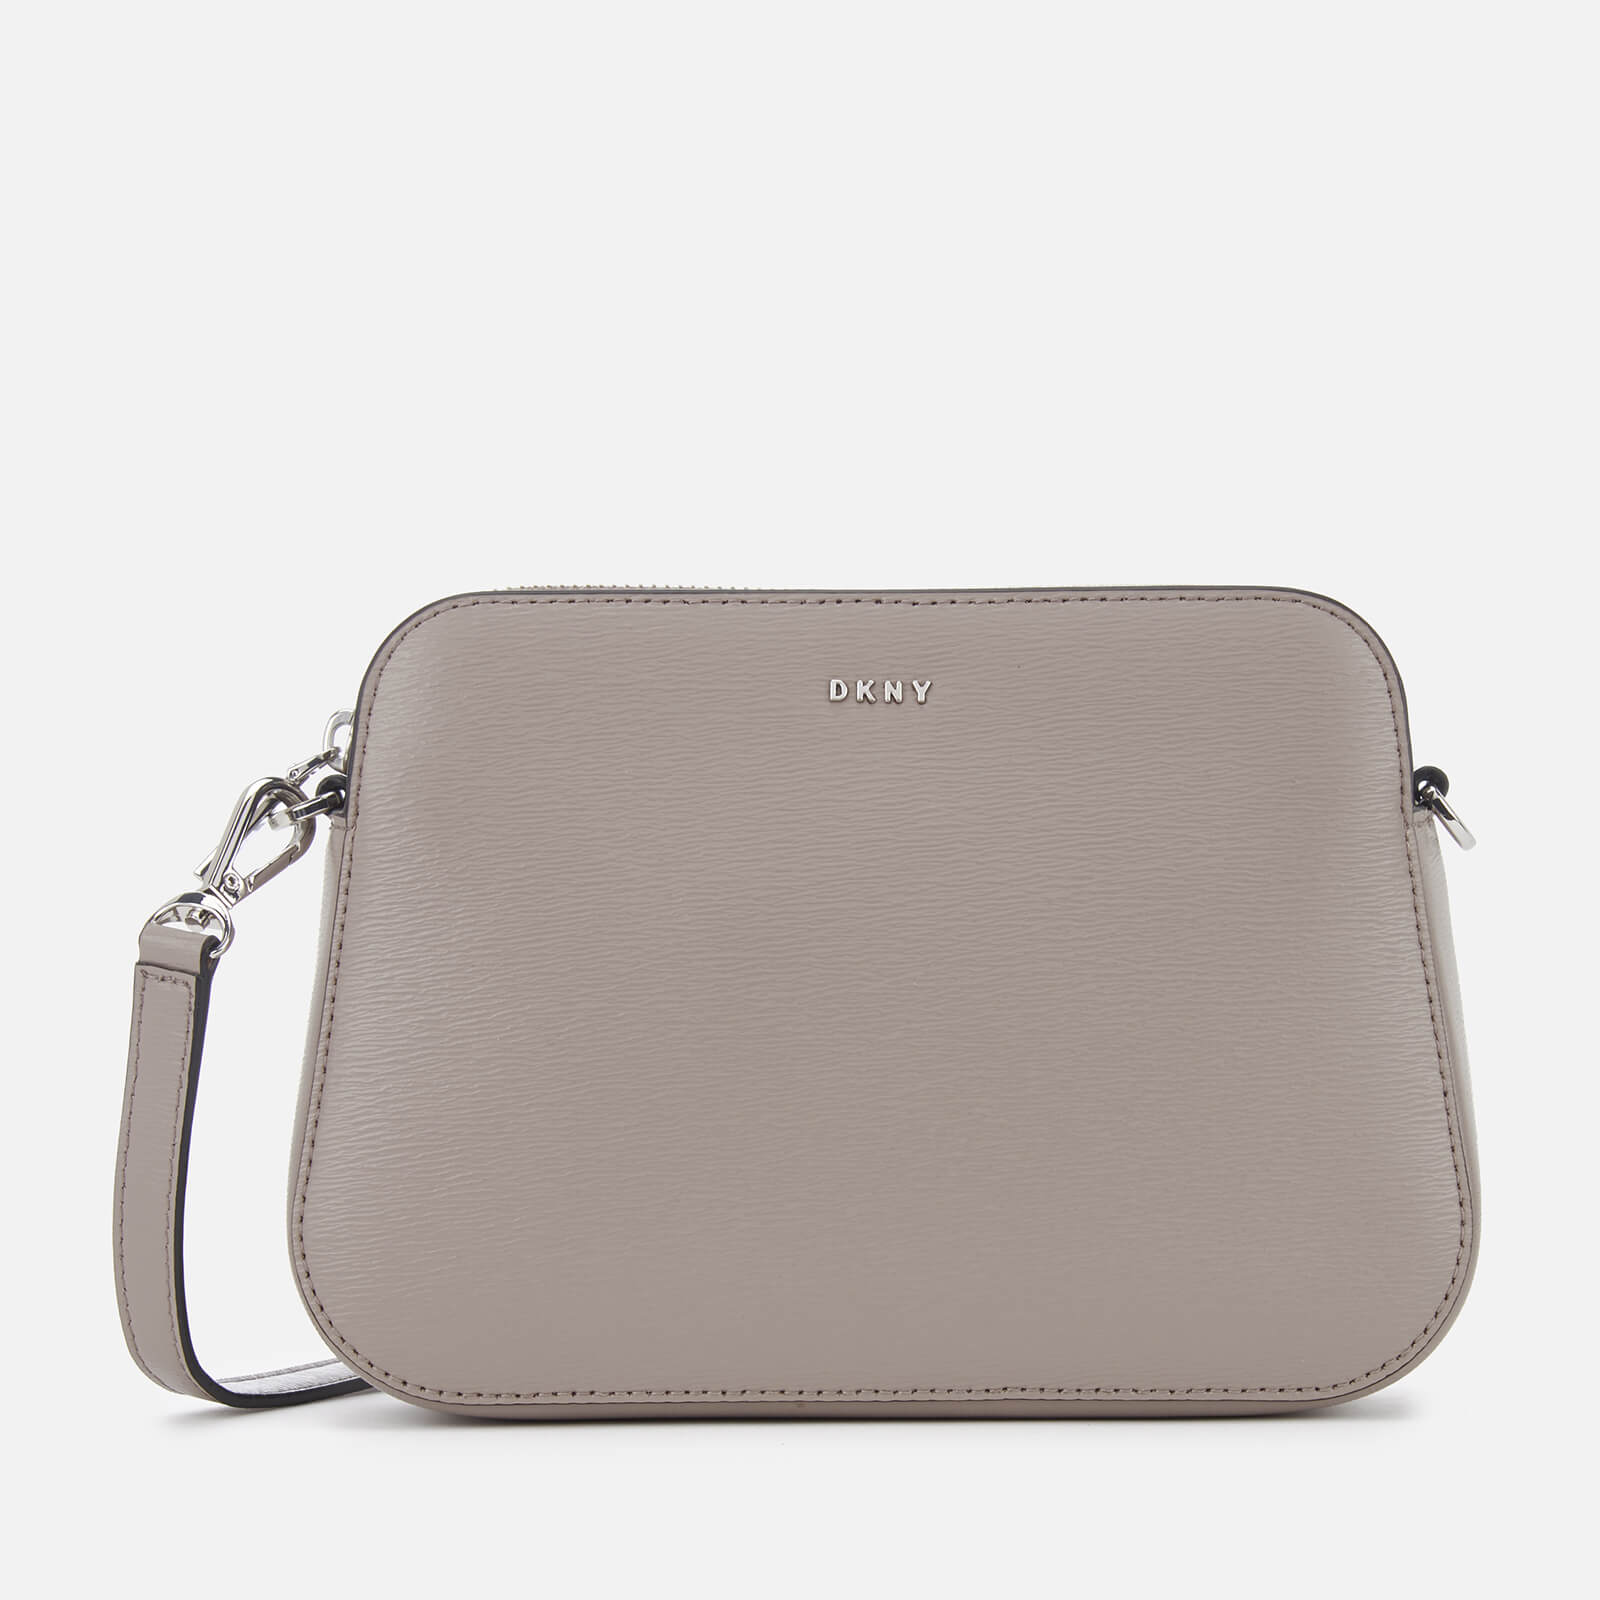 66cd0843f6e DKNY Women s Bryant Centre Zip Cross Body Bag - Warm Grey Womens  Accessories